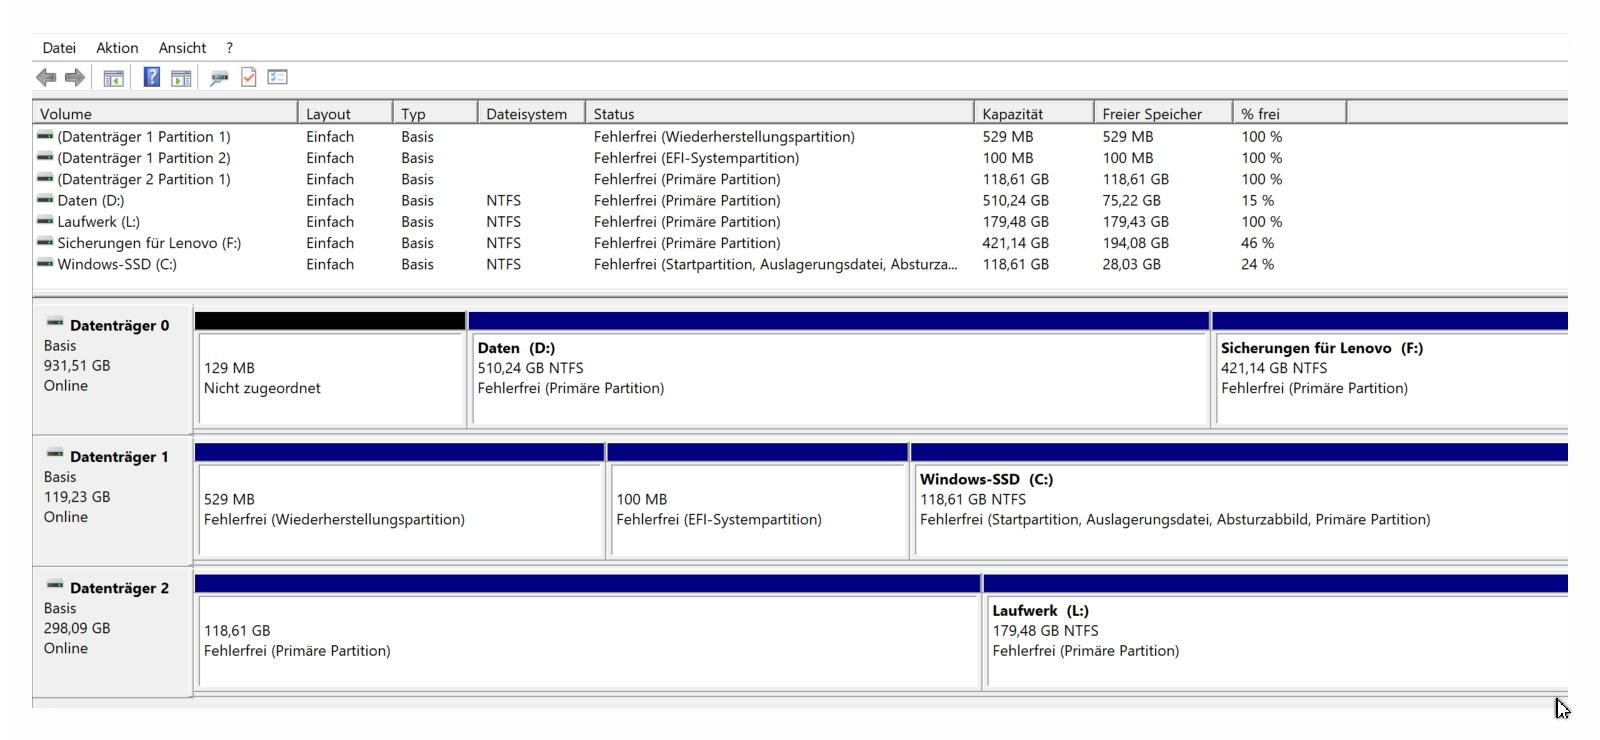 Datenträgerverwaltung2